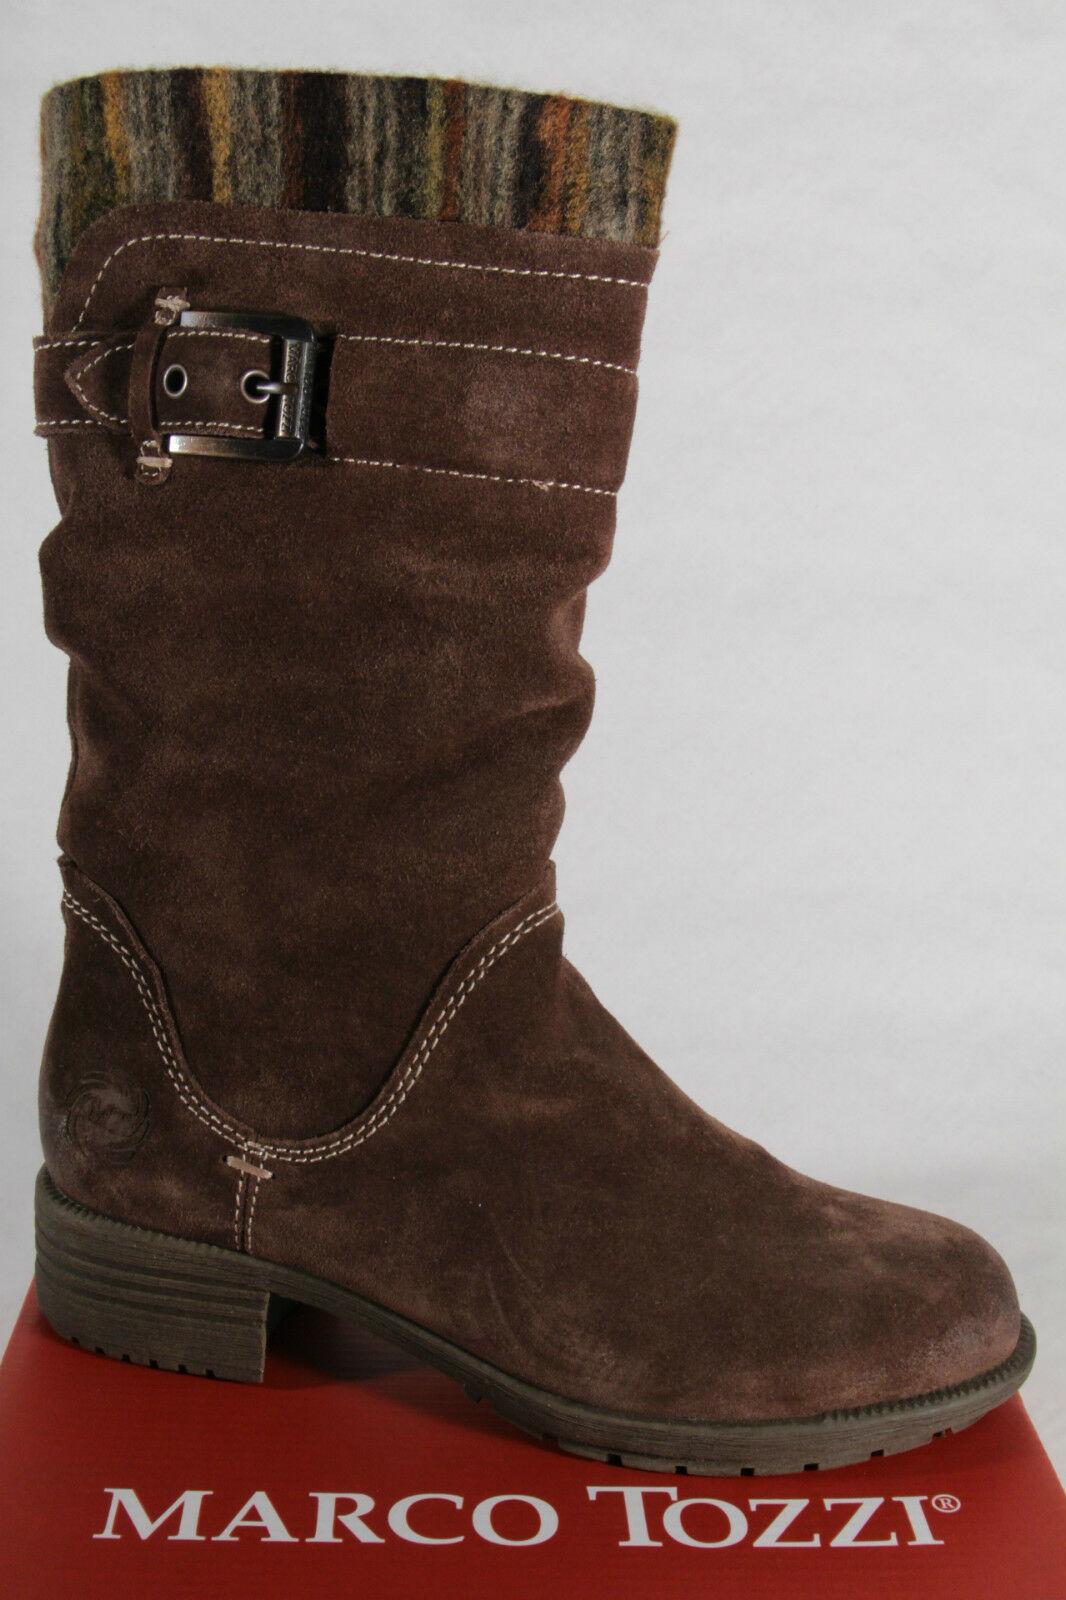 8d570dccc7f1 Marco Tozzi Damen Stiefel Stiefeletten Winterstiefel Boots SP 39, 00 € NEU!